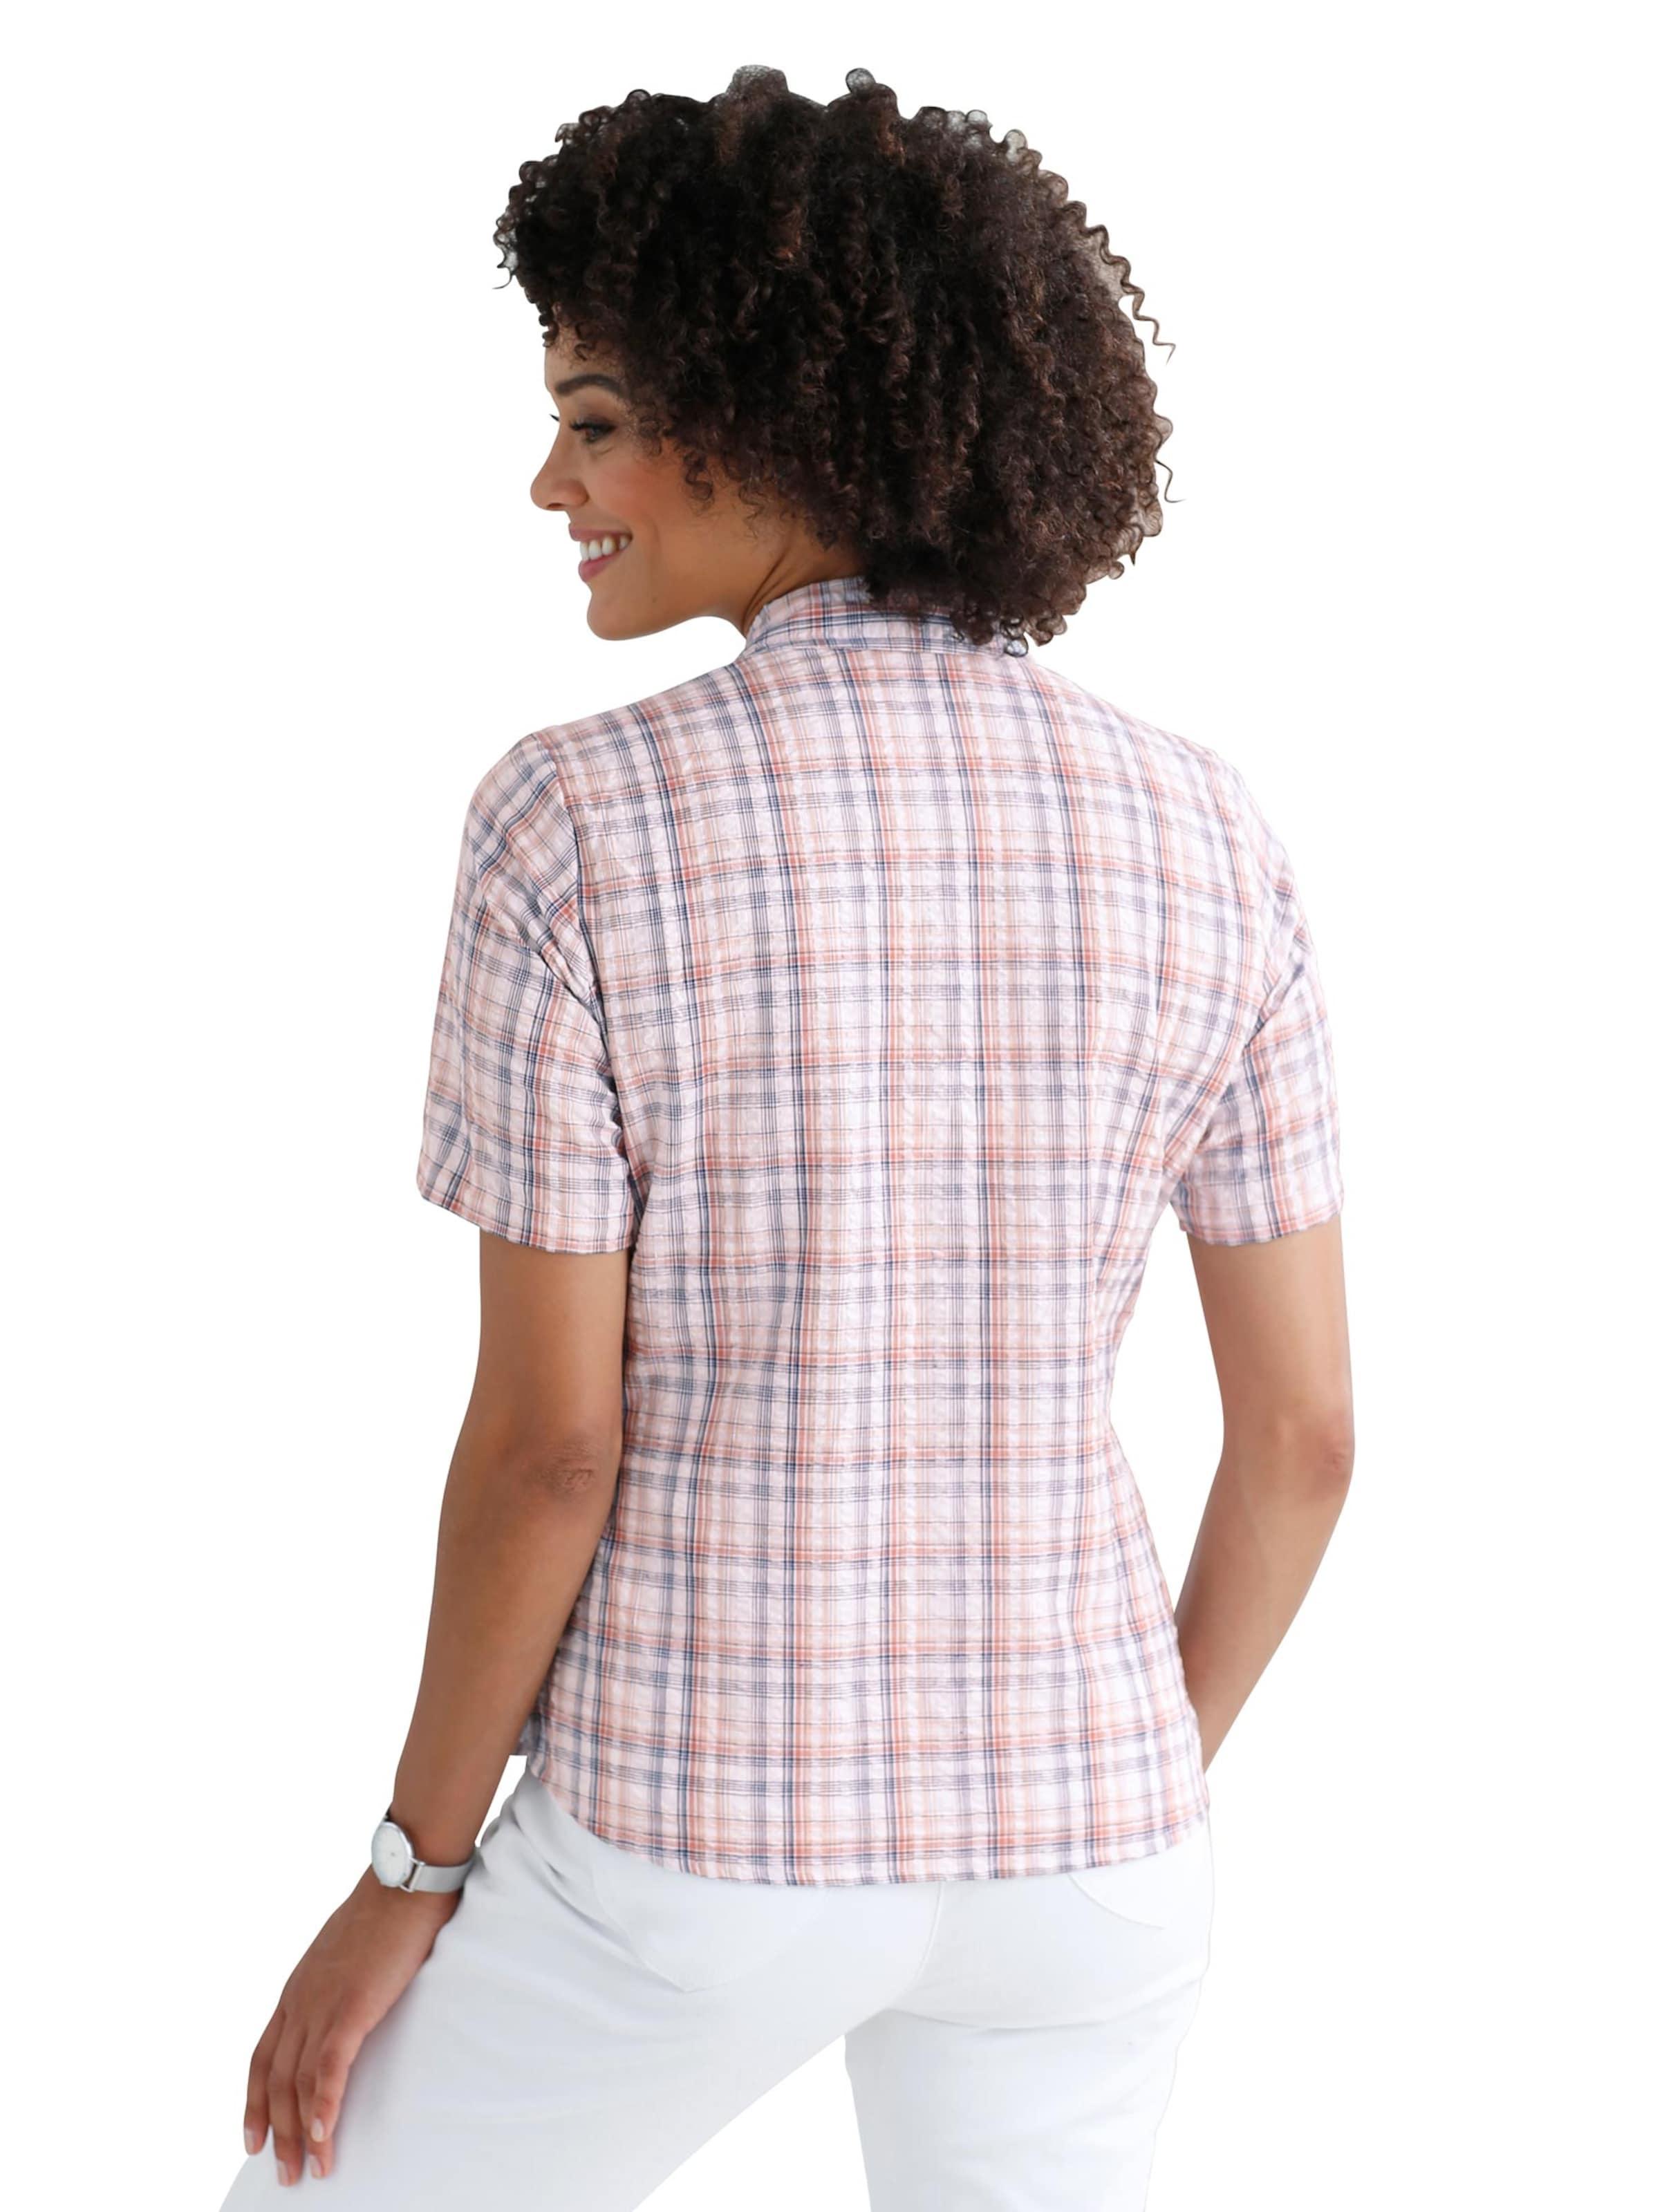 Your Look... for less! Dames Katoenen blouse grapefruit-geruit Größe